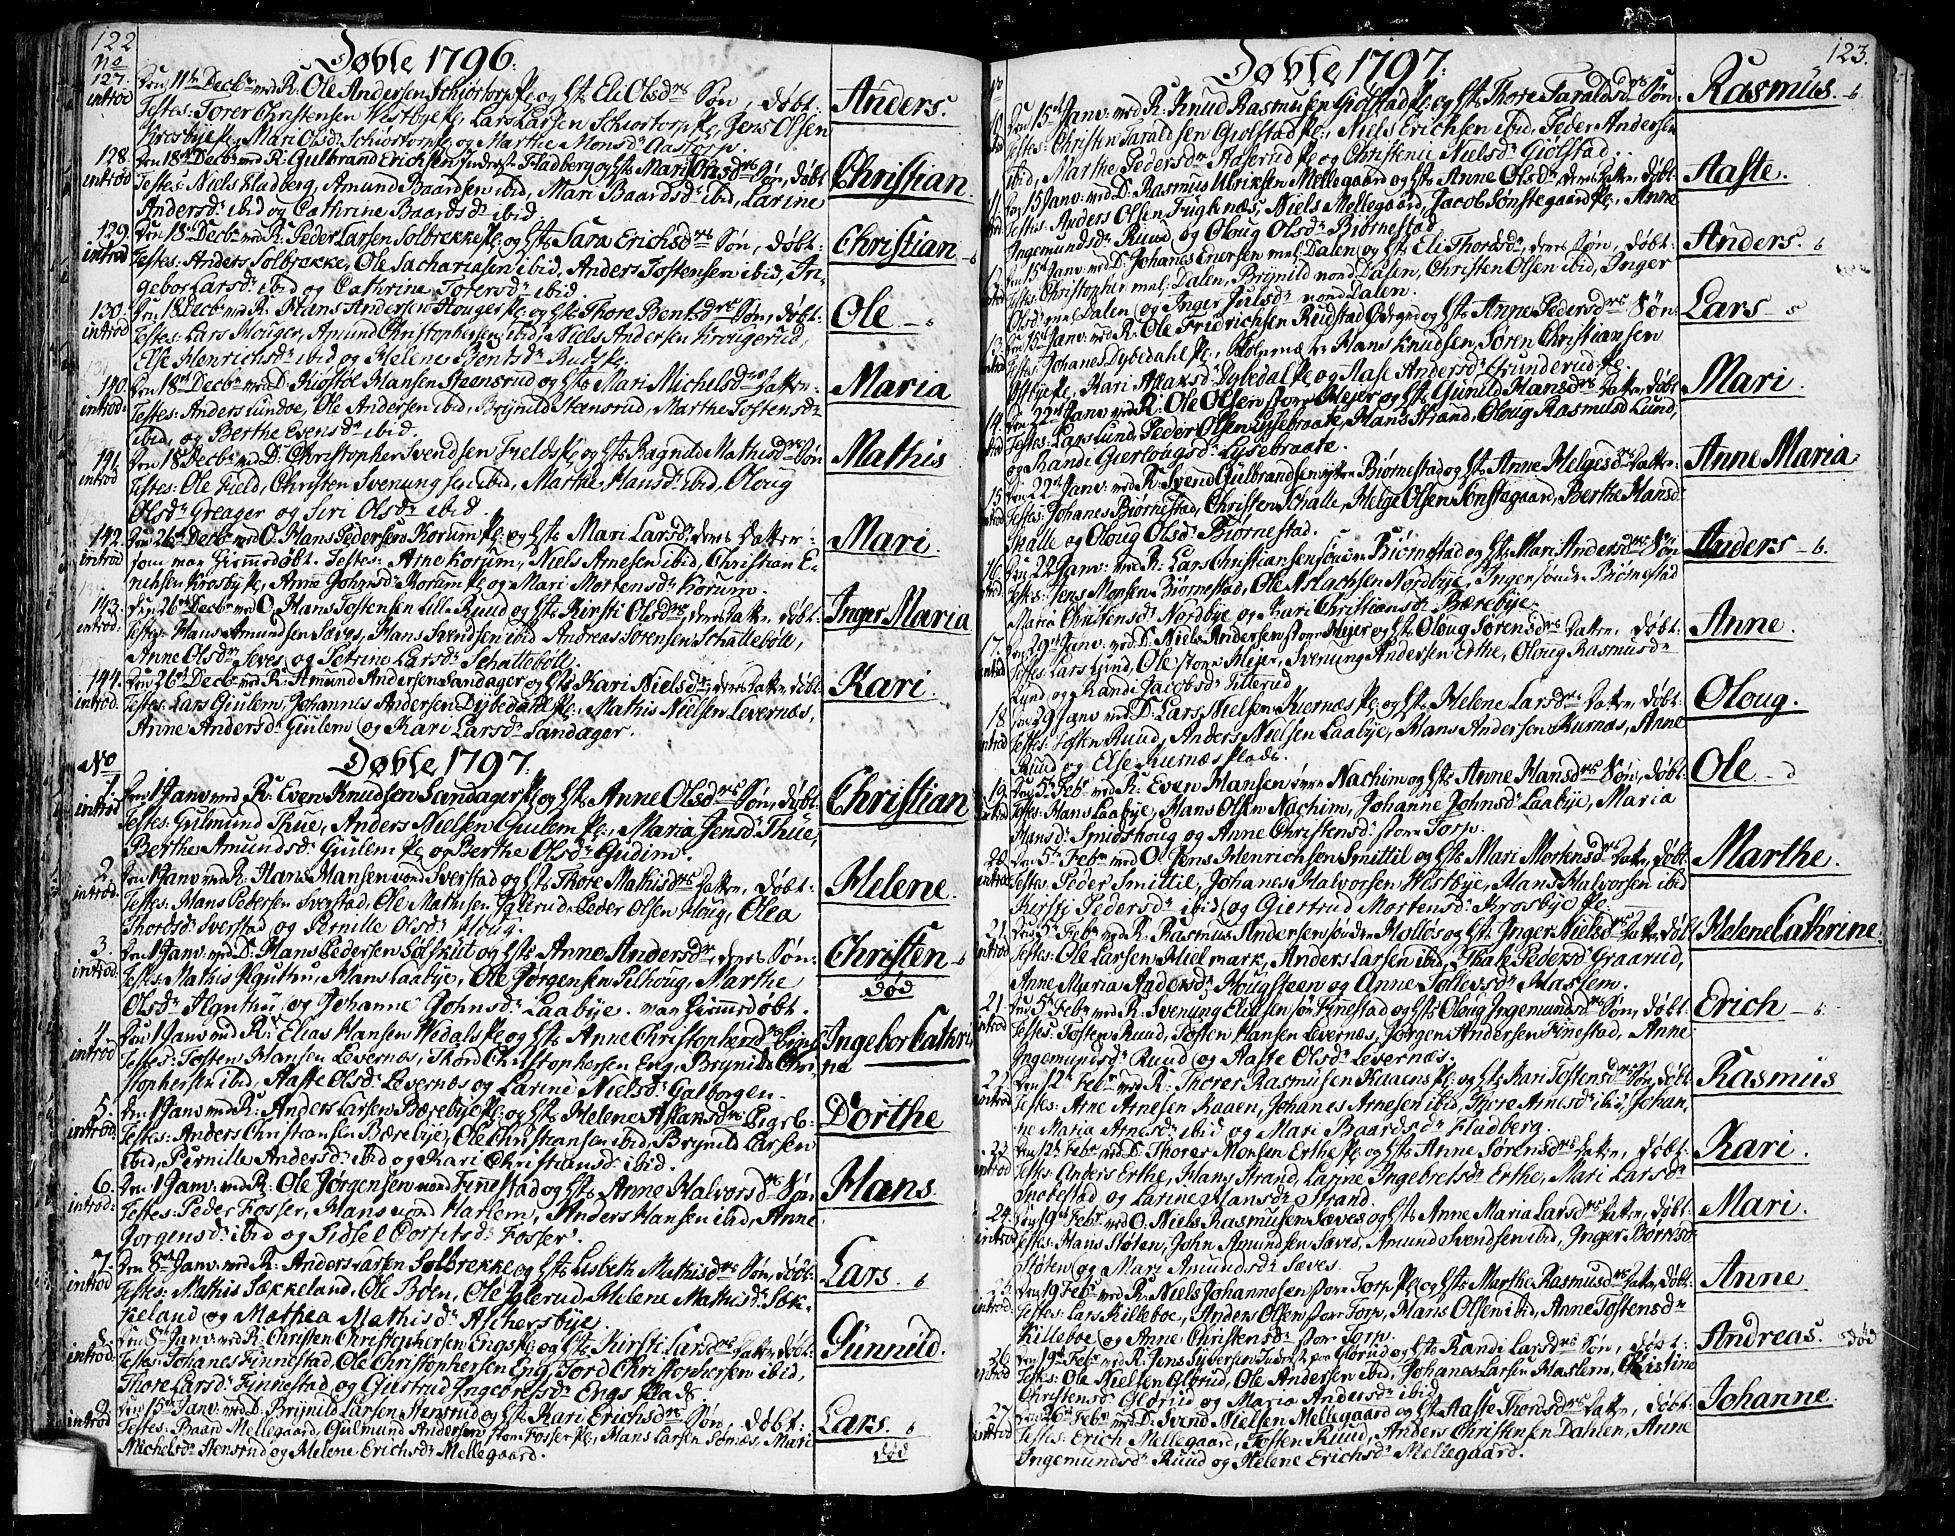 SAO, Rakkestad prestekontor Kirkebøker, F/Fa/L0005: Ministerialbok nr. I 5, 1784-1814, s. 122-123